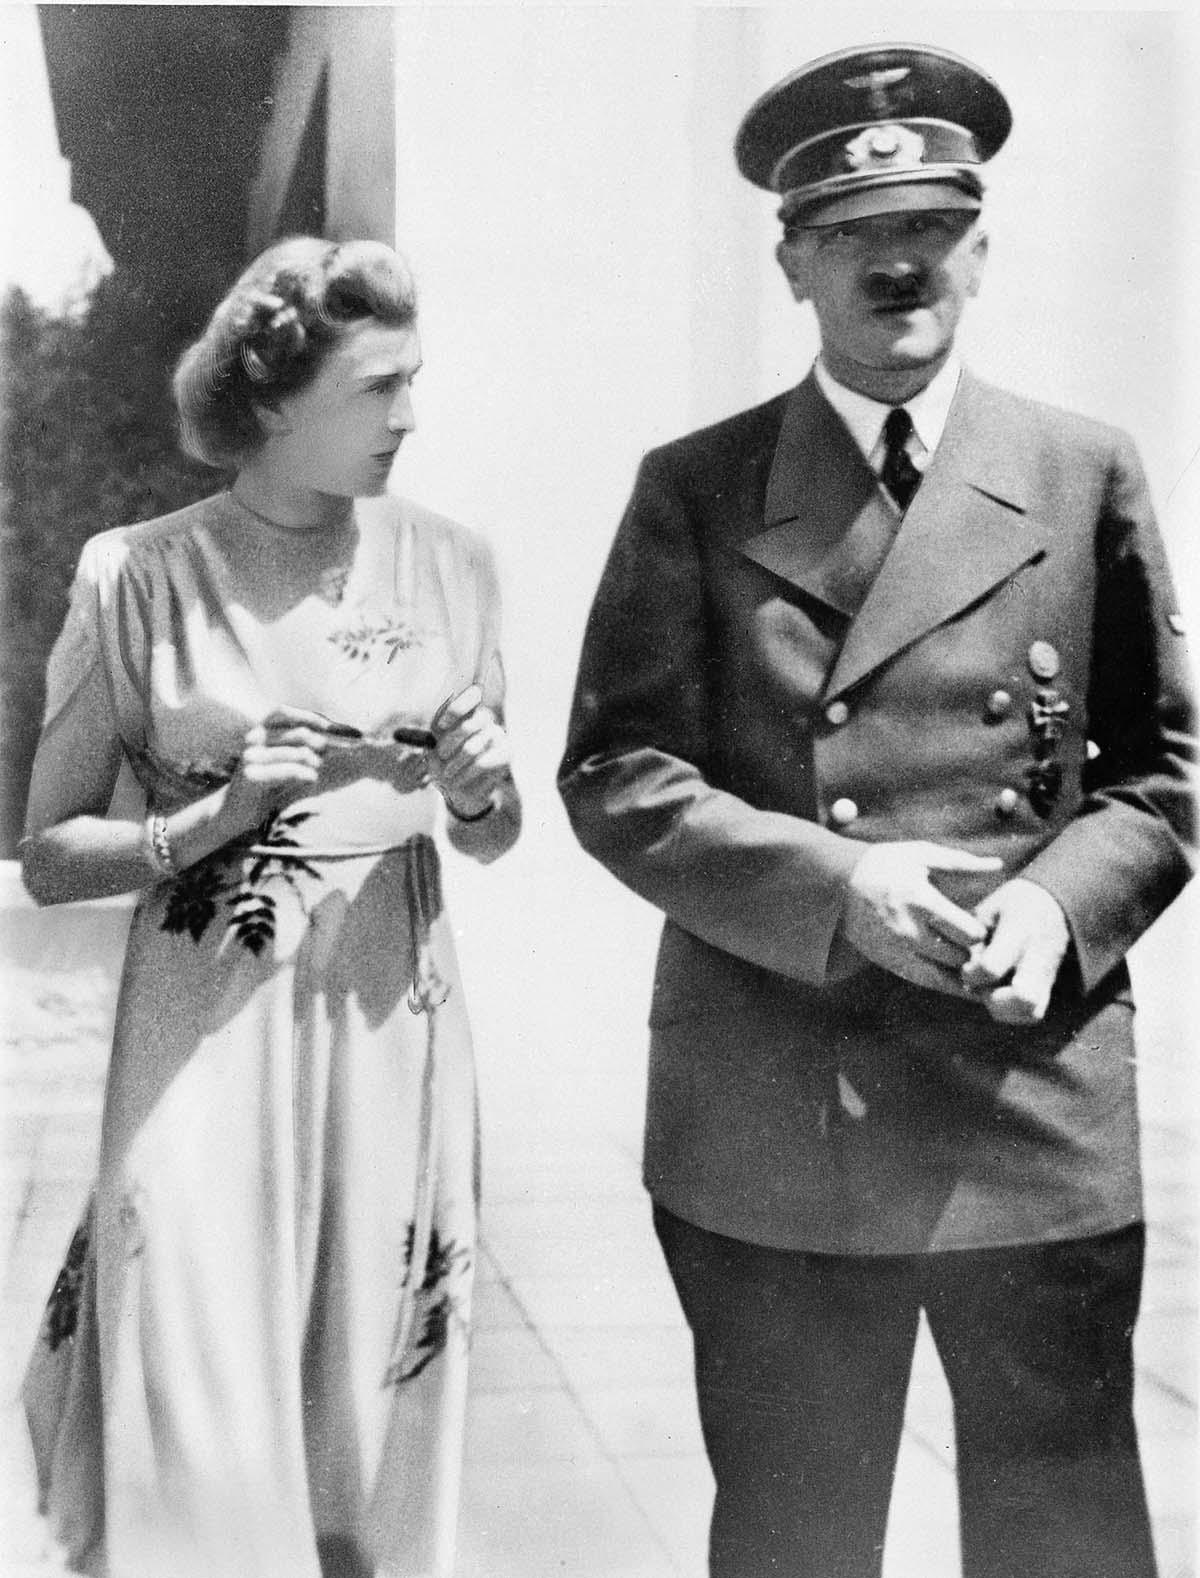 Eva Braun with Hitler in Berchtesgaden ca. 1944.